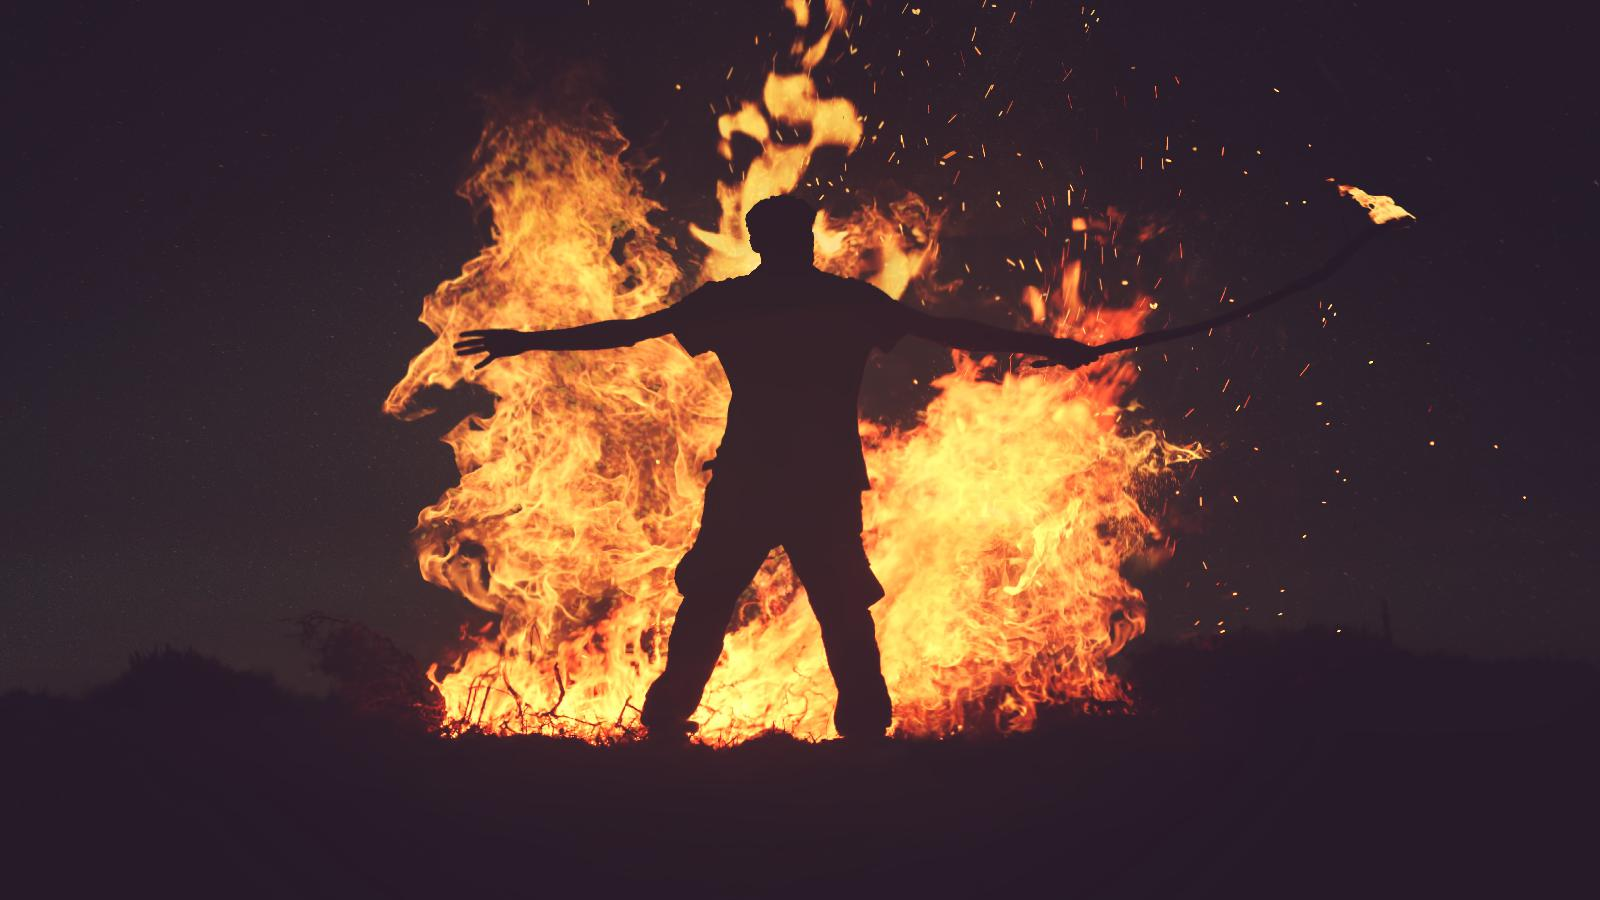 Binance burns $37.7 million worth of BNB